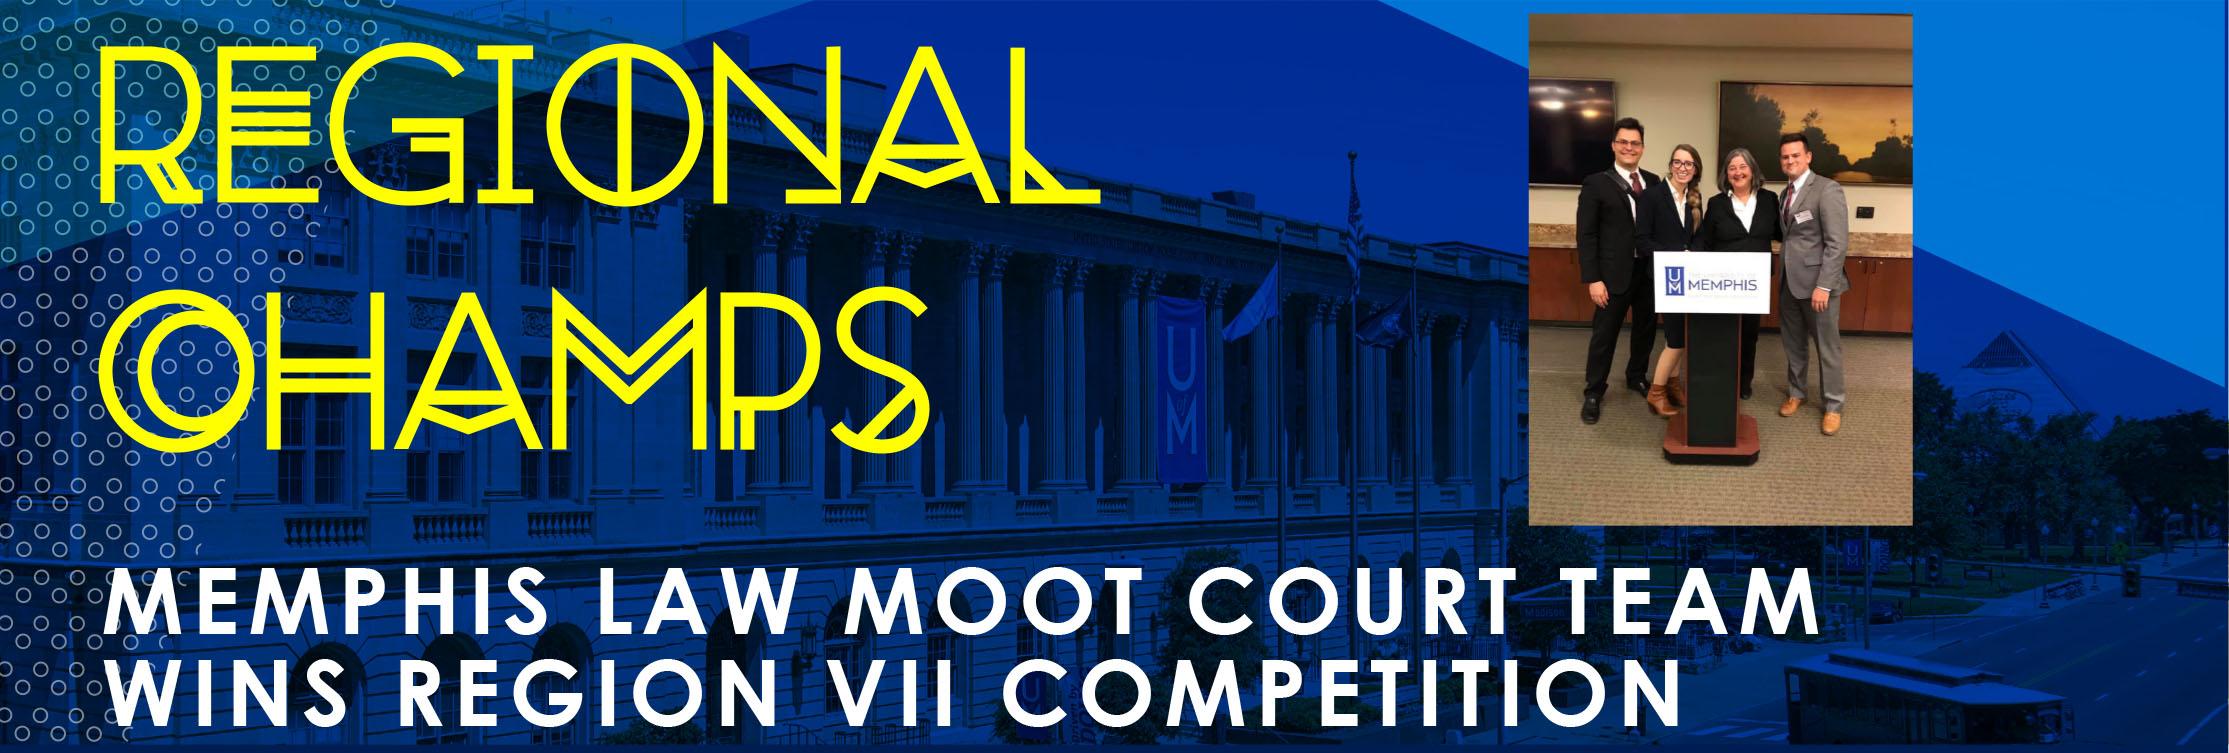 Moot Court championship banner